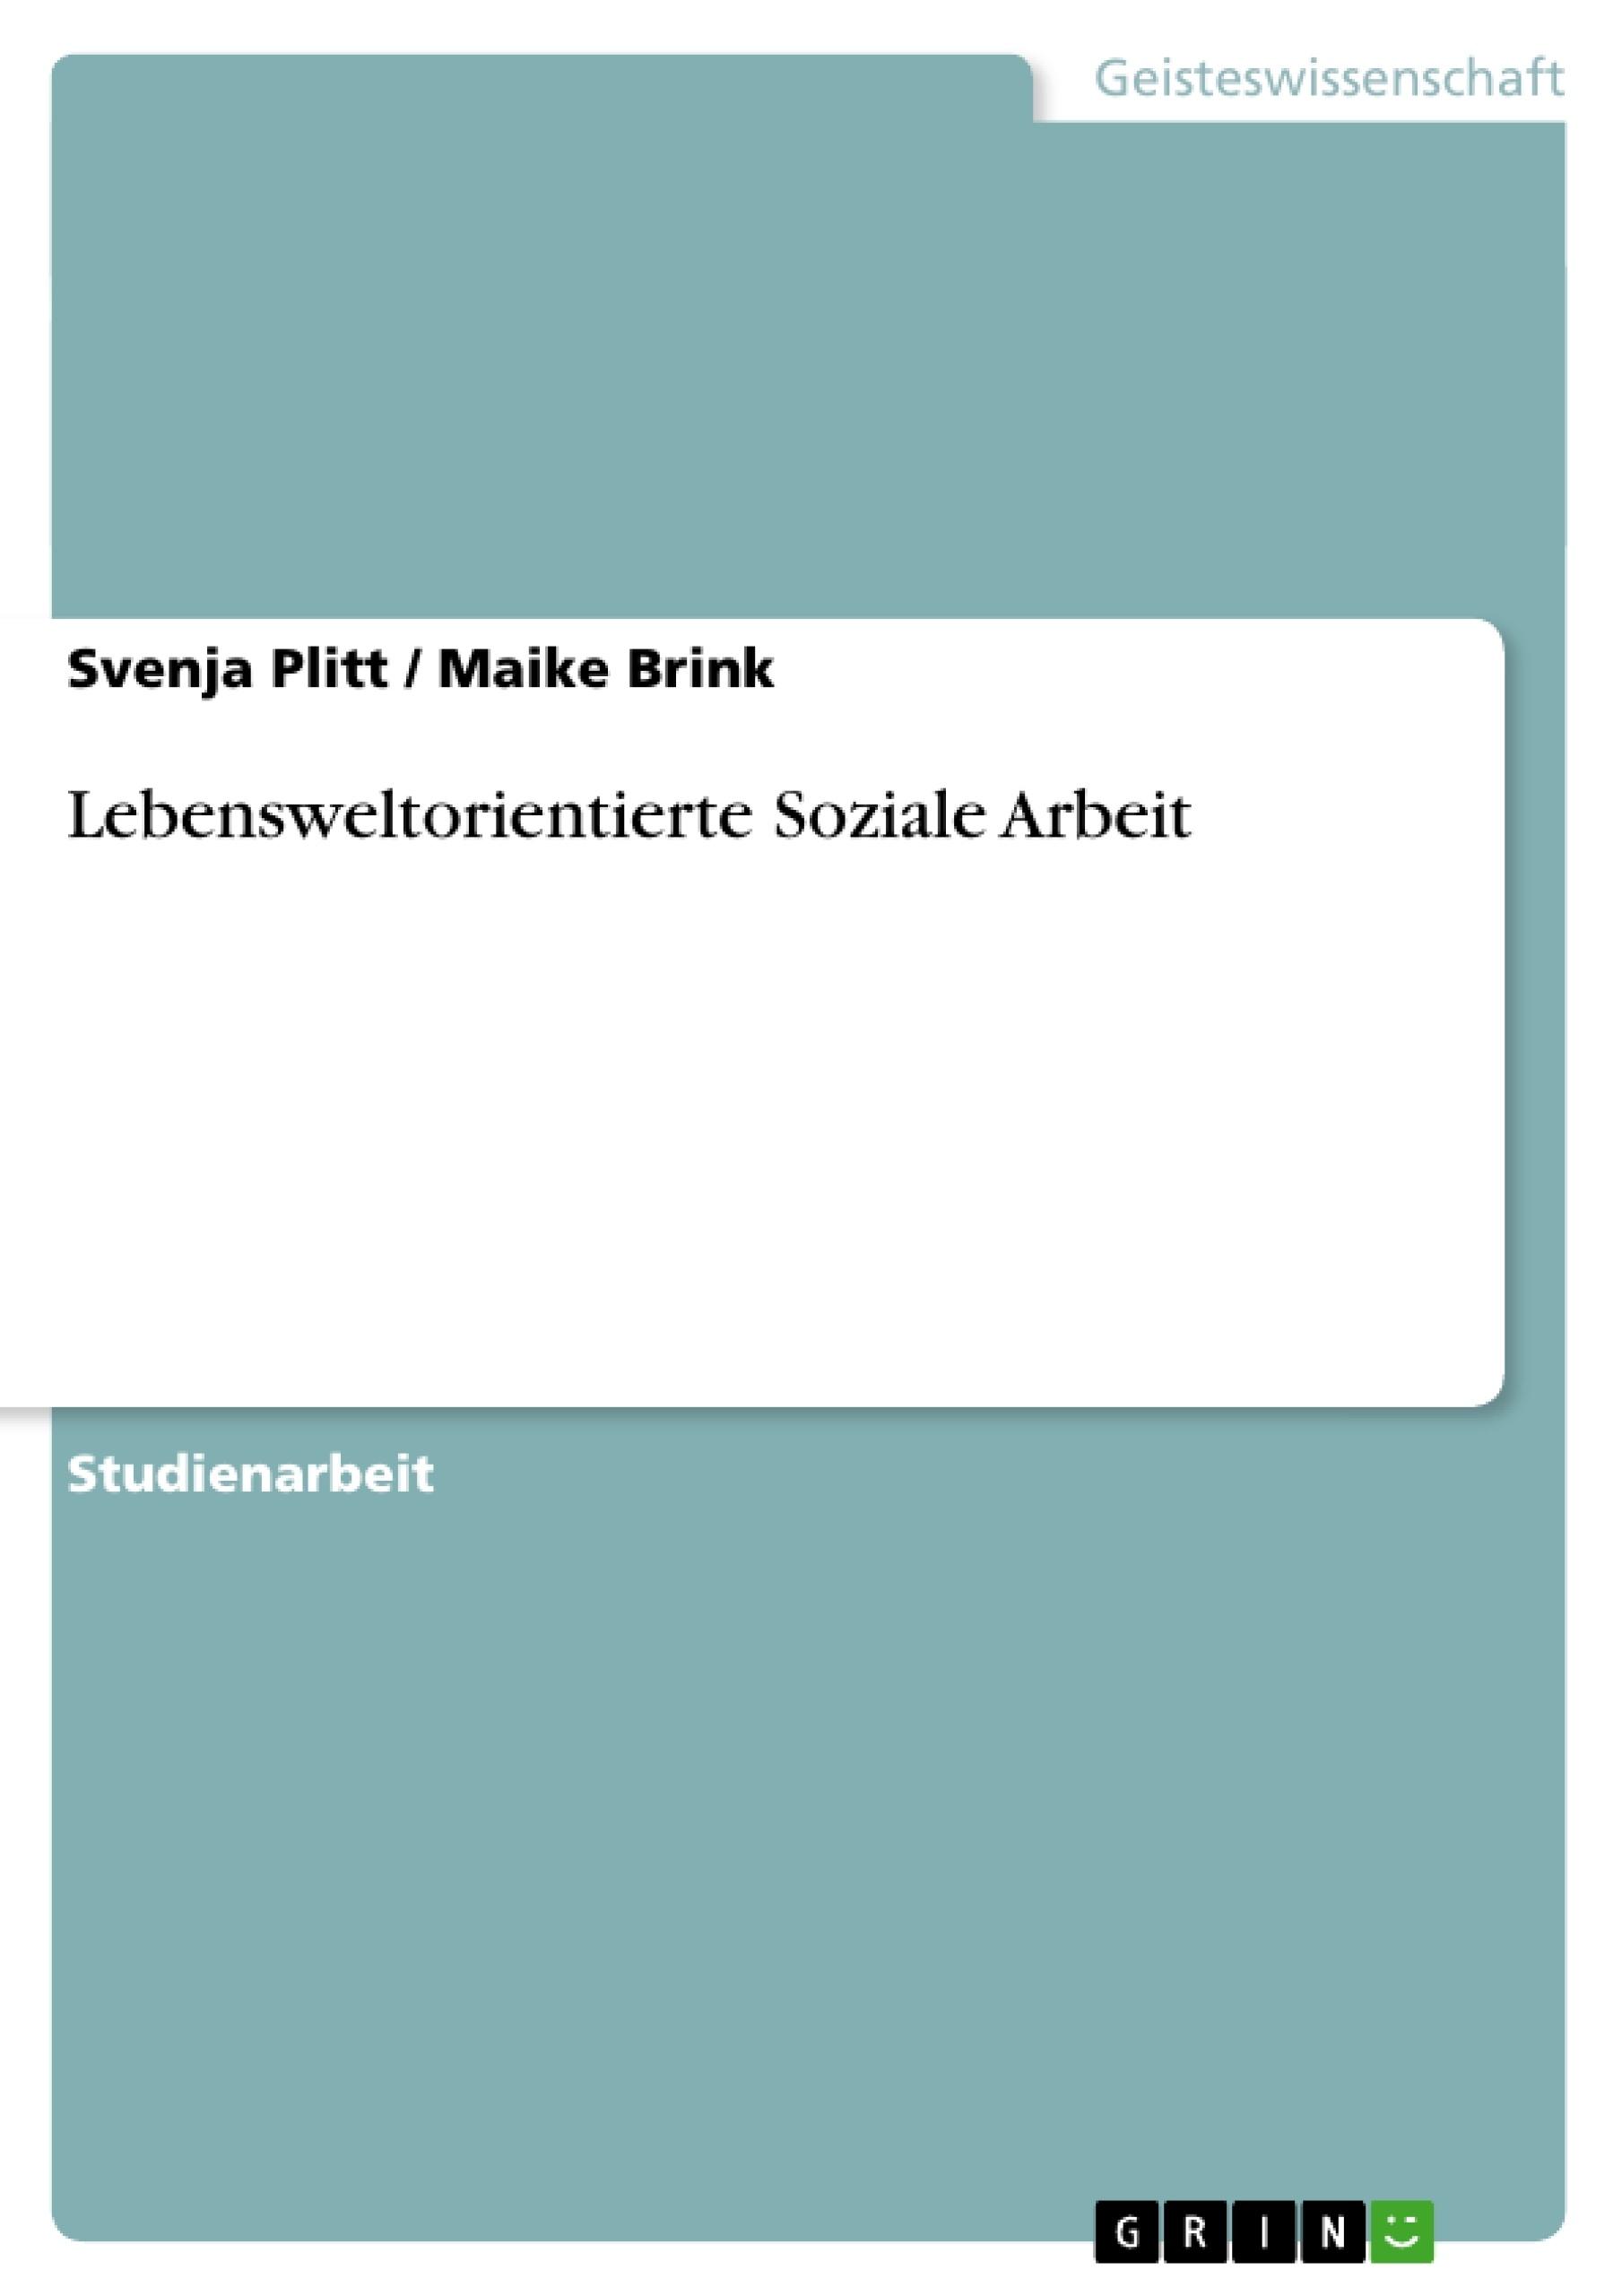 Titel: Lebensweltorientierte Soziale Arbeit